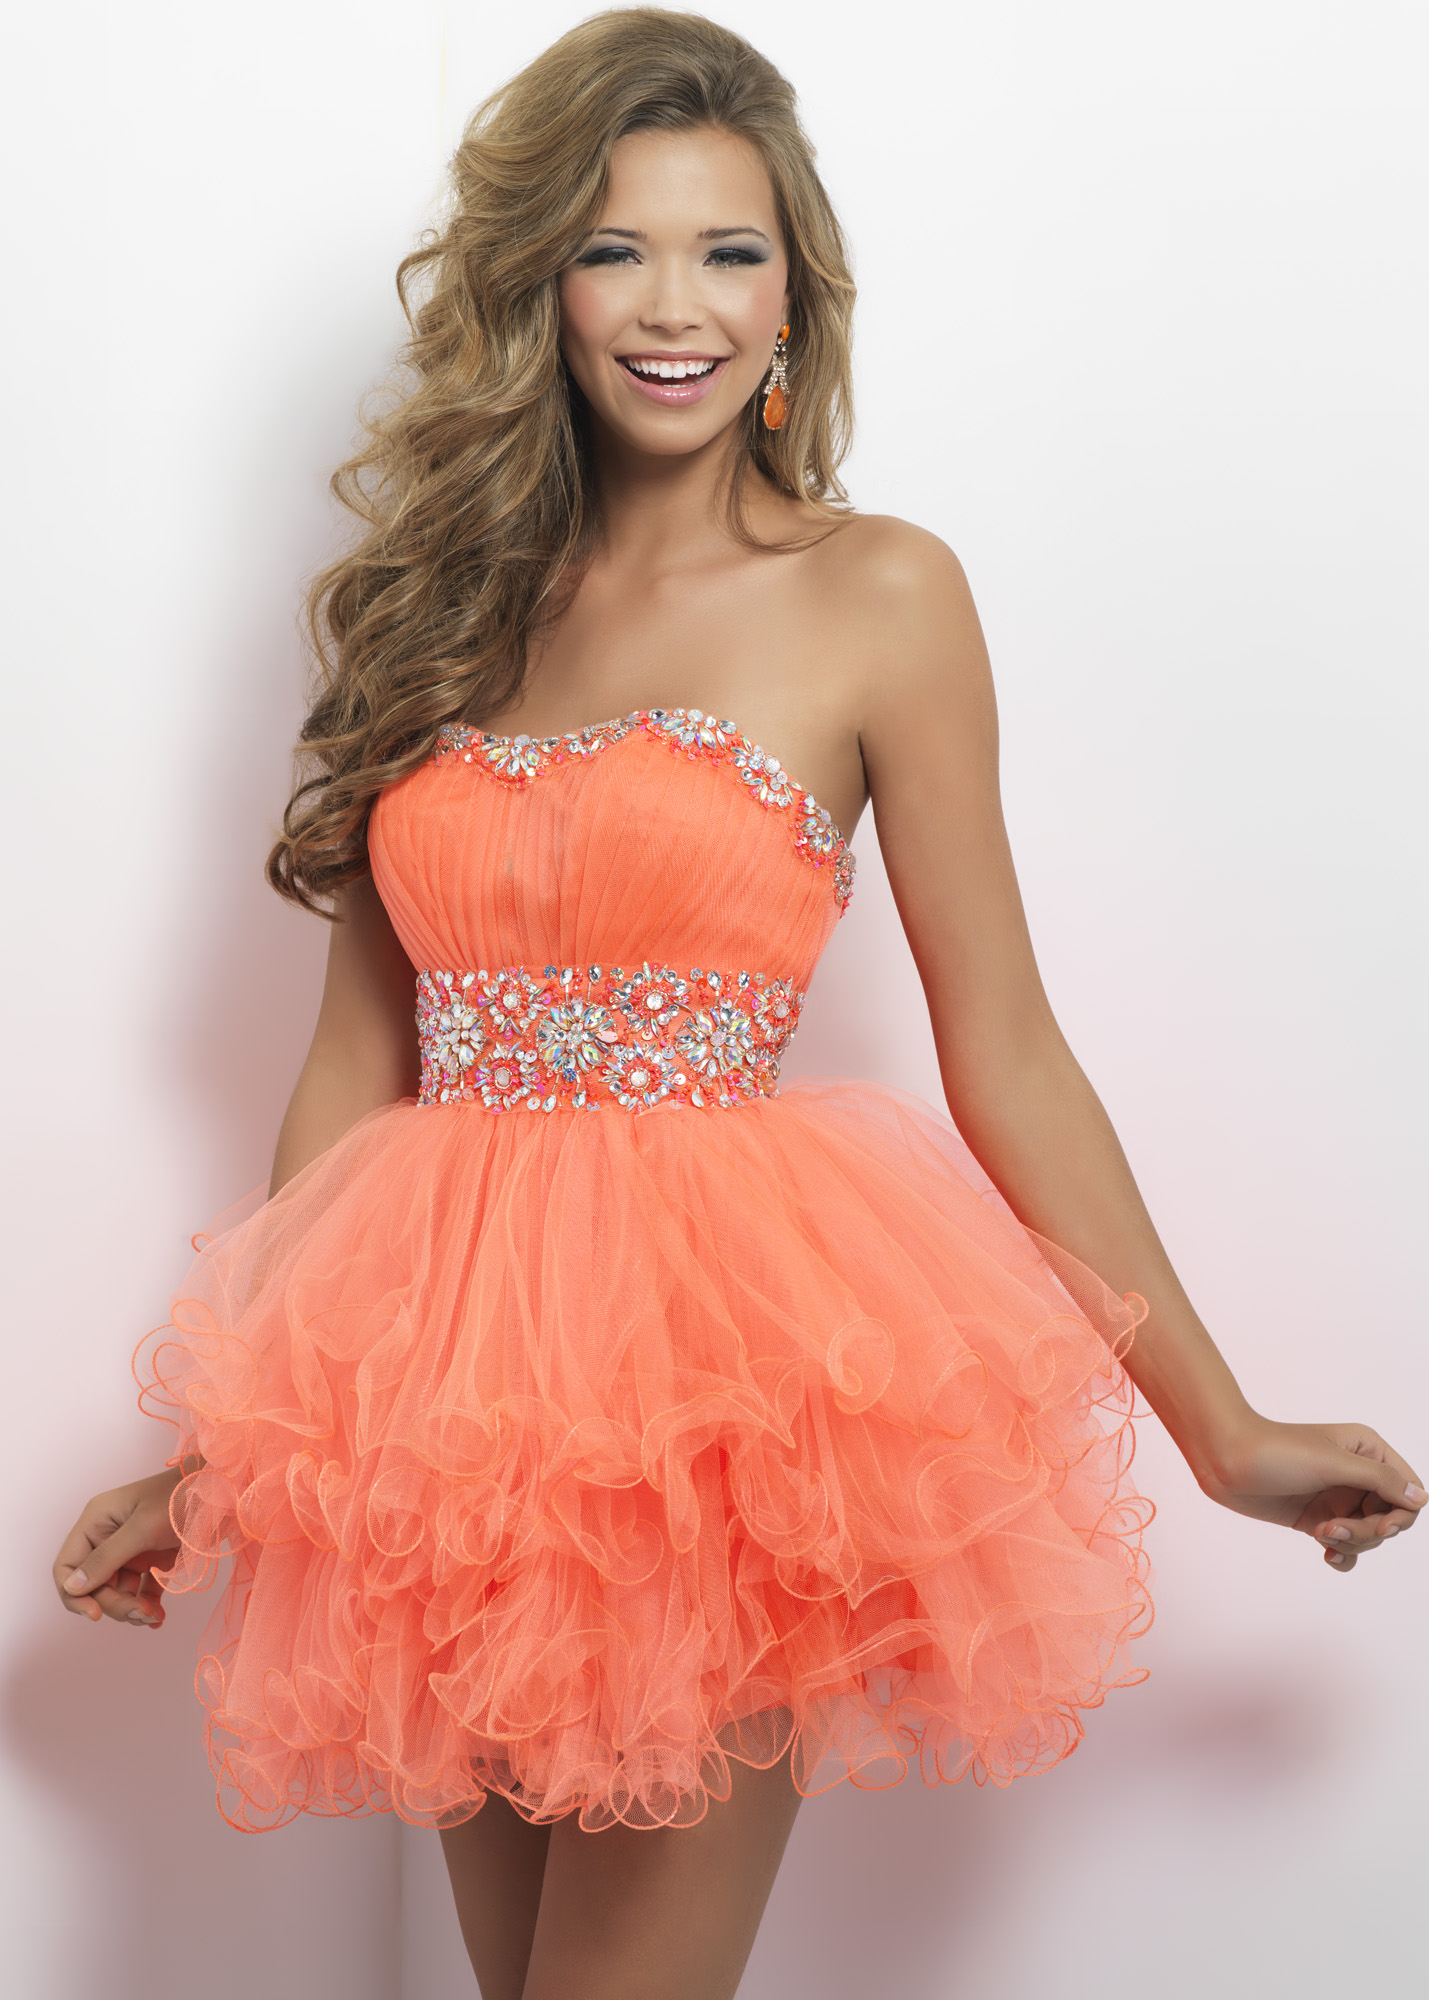 Tangelo orange strapless beaded gown